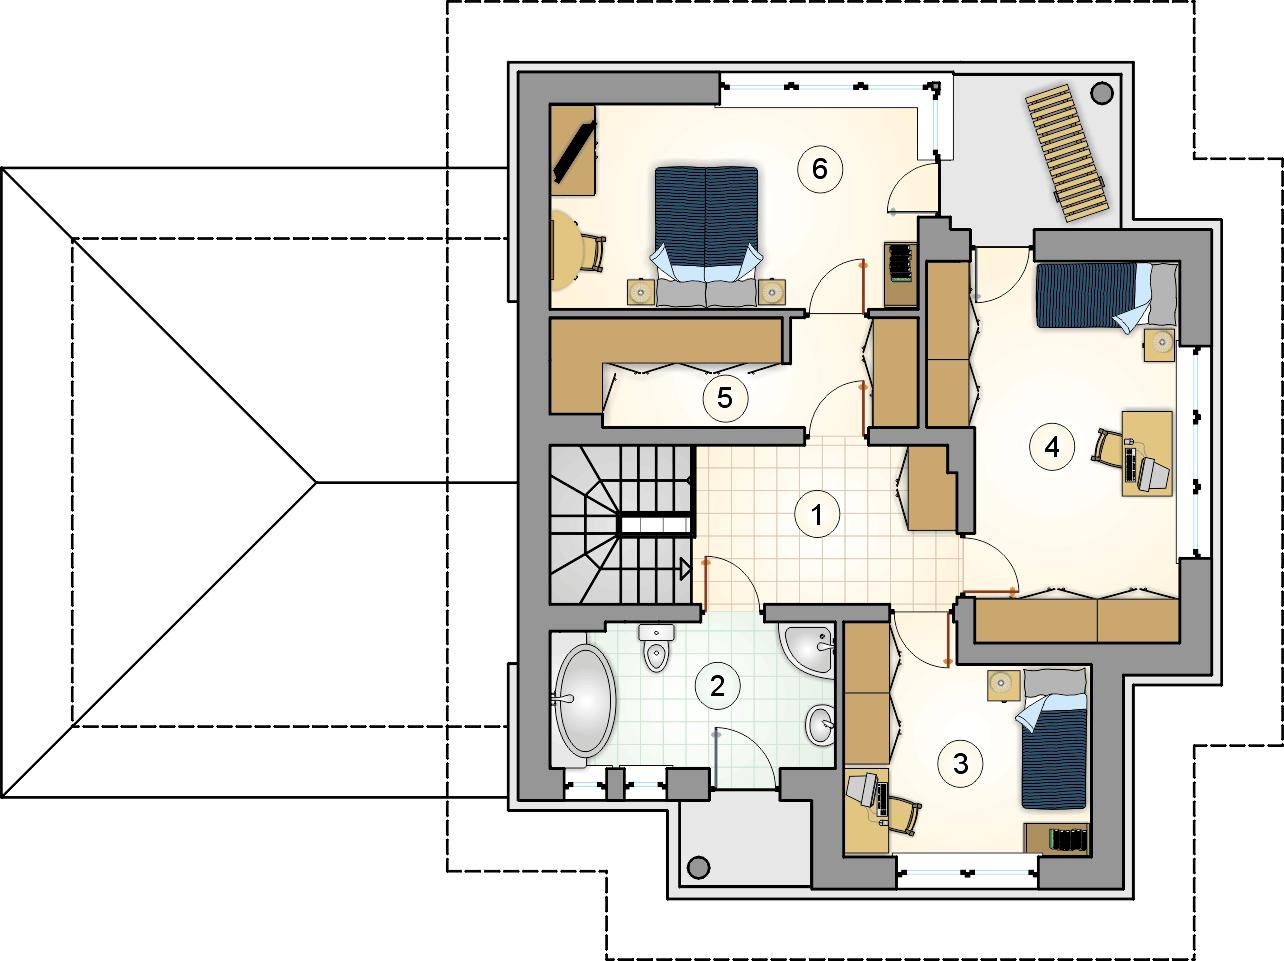 Rzut piętra - projekt Figaro - wersja lustrzana